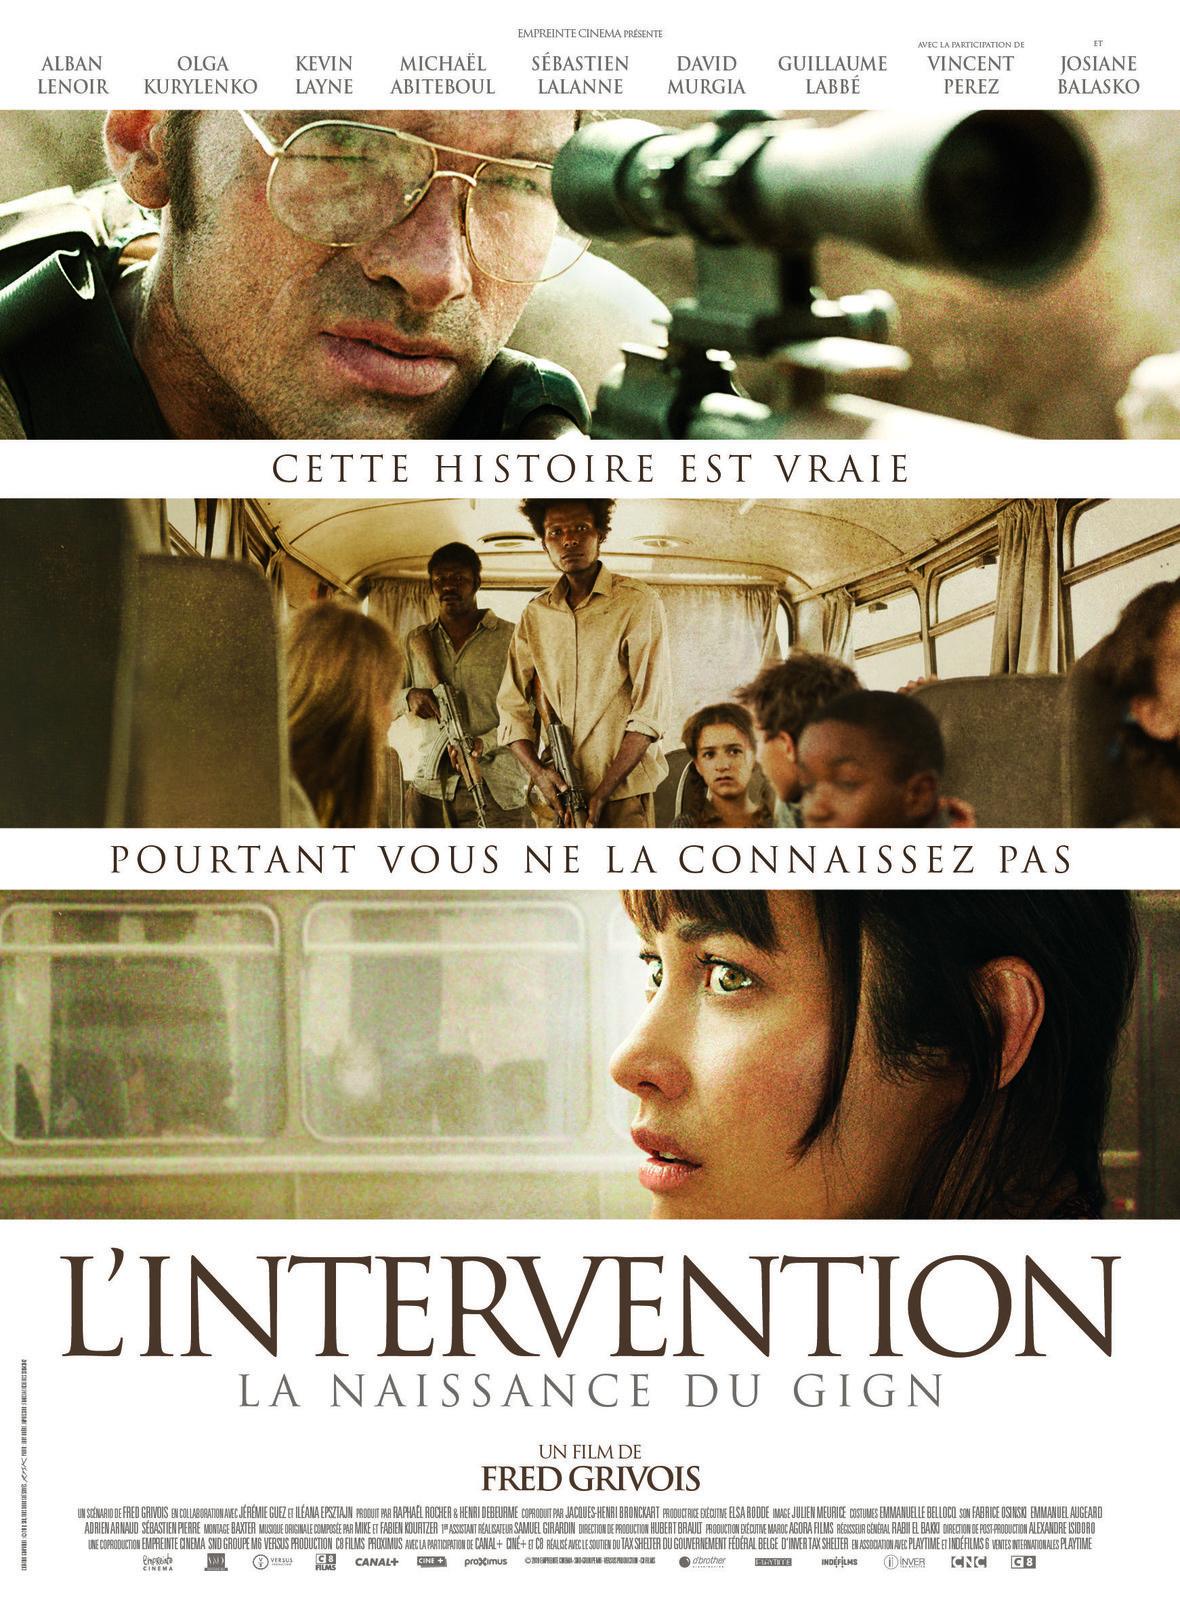 15 Minutos de Guerra [Dub] – IMDB 5.9